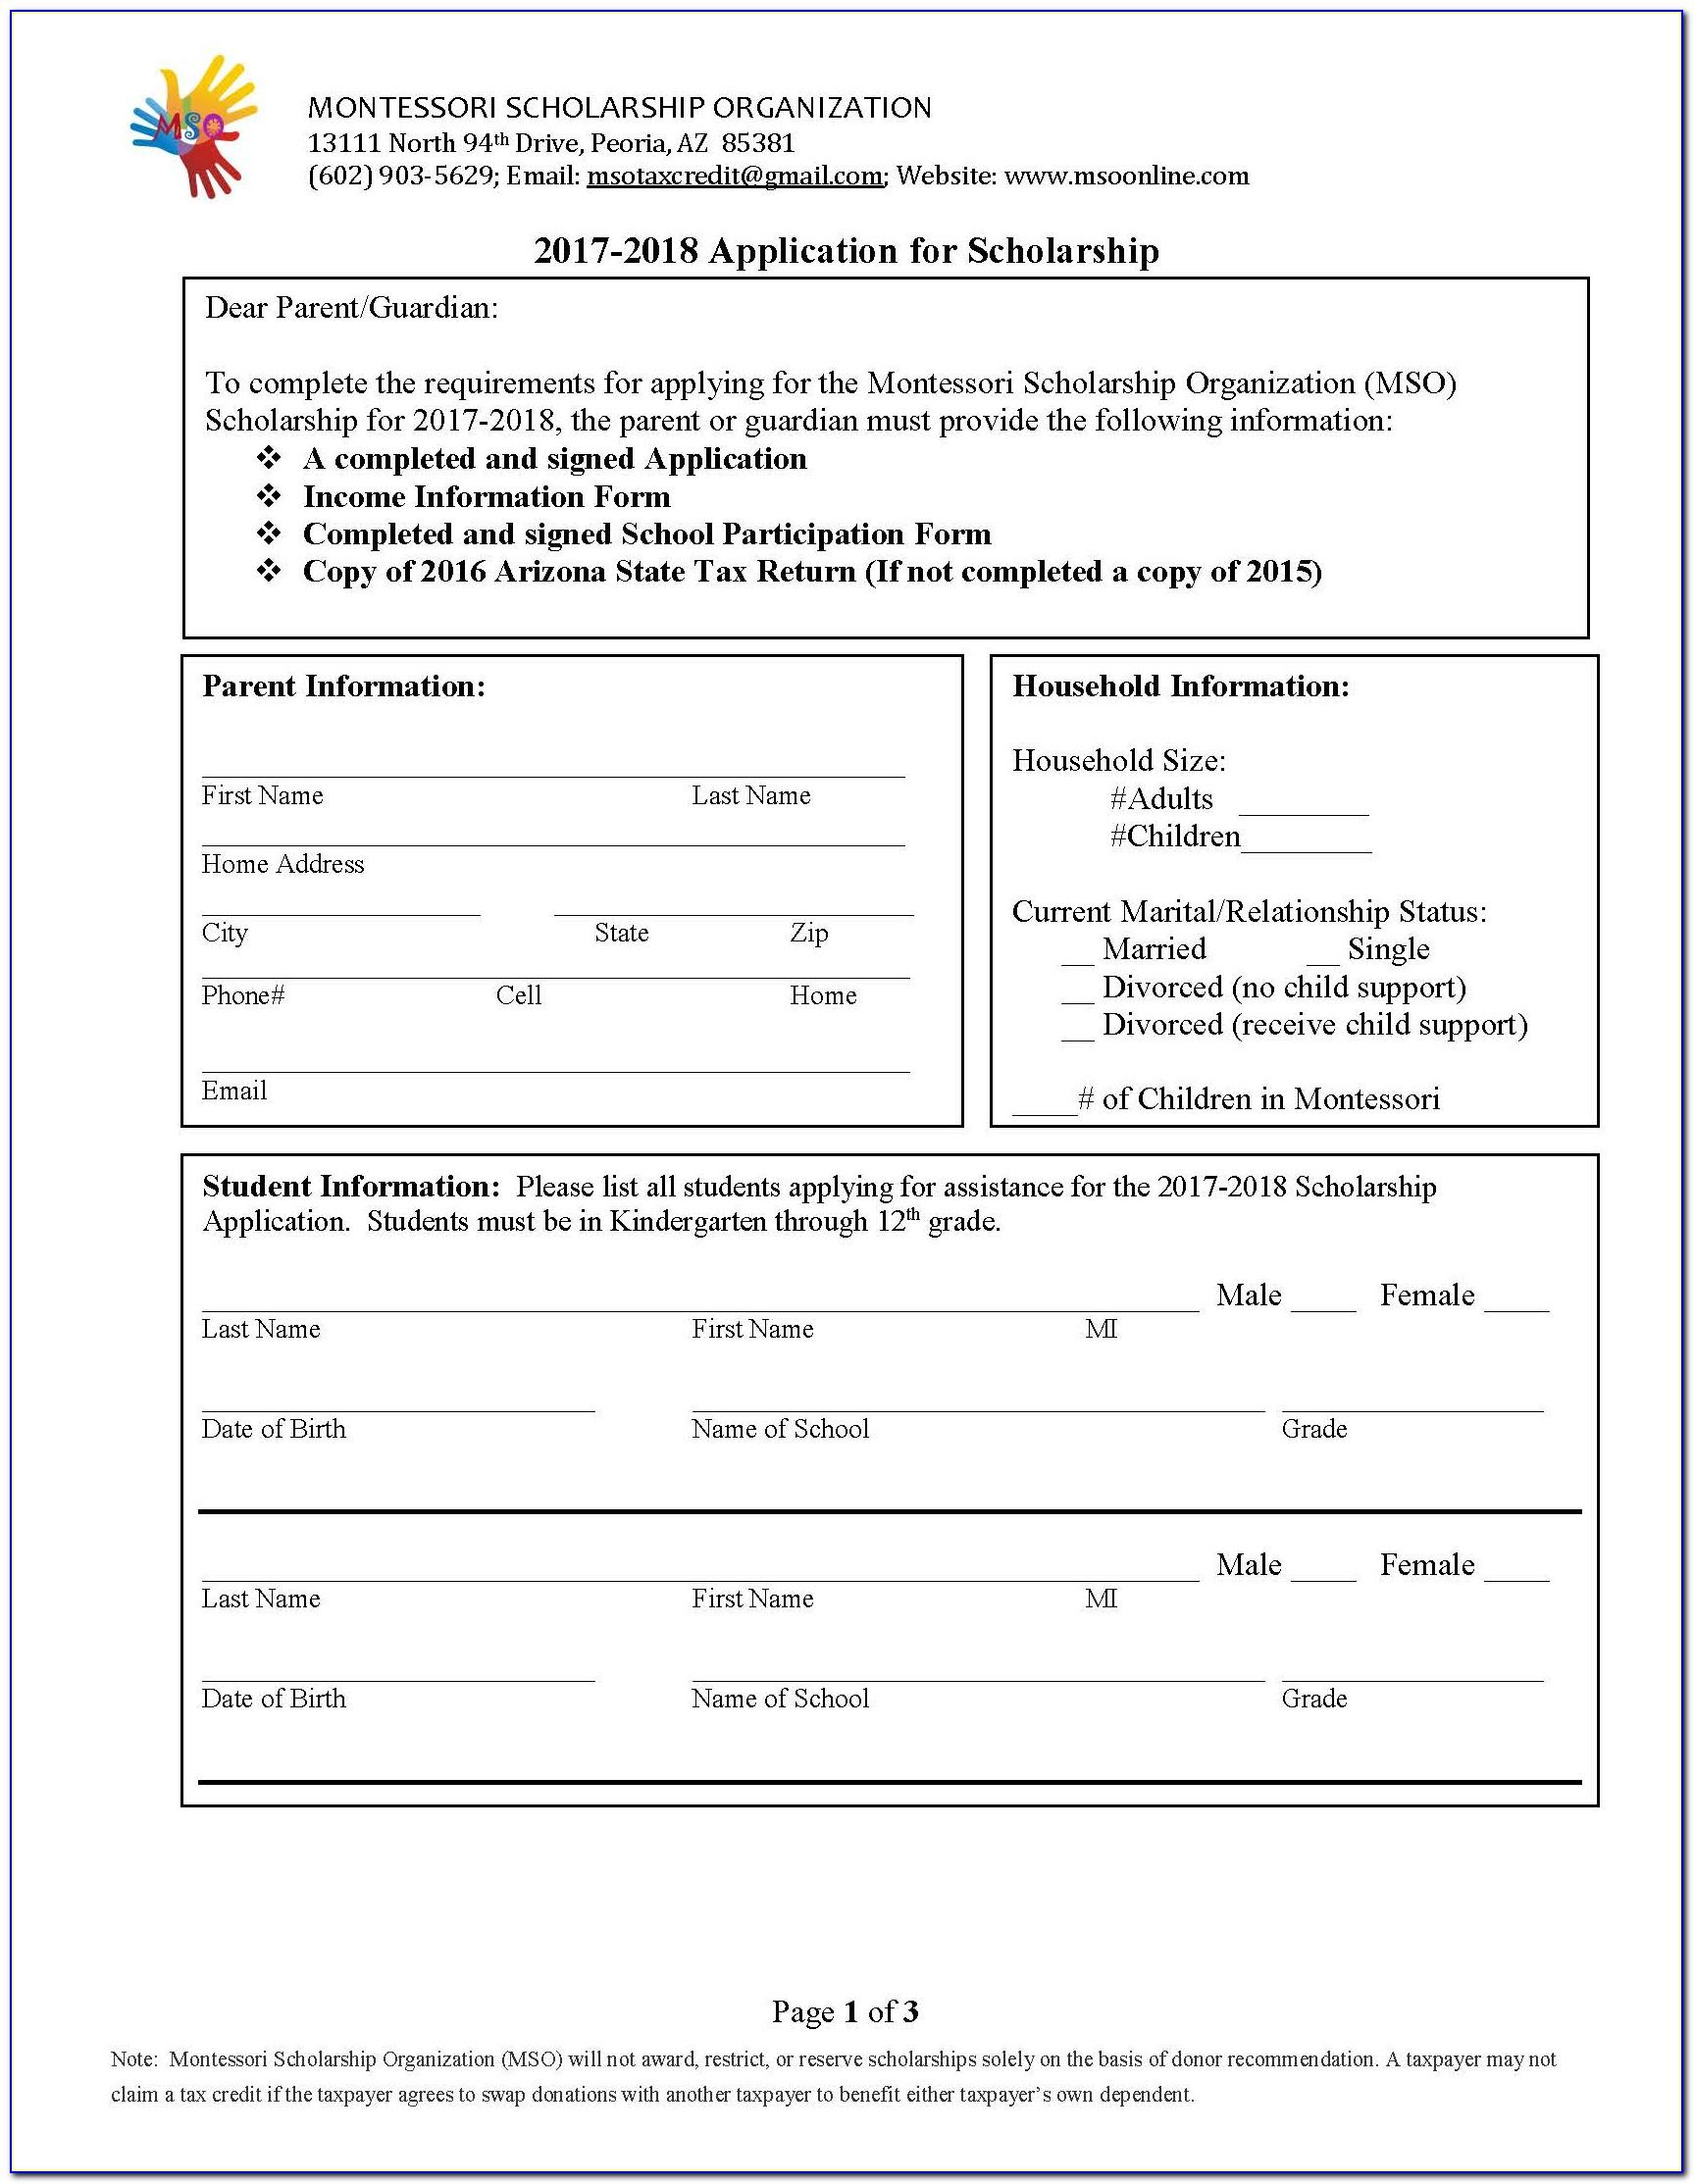 Non Profit Organization Form 1023